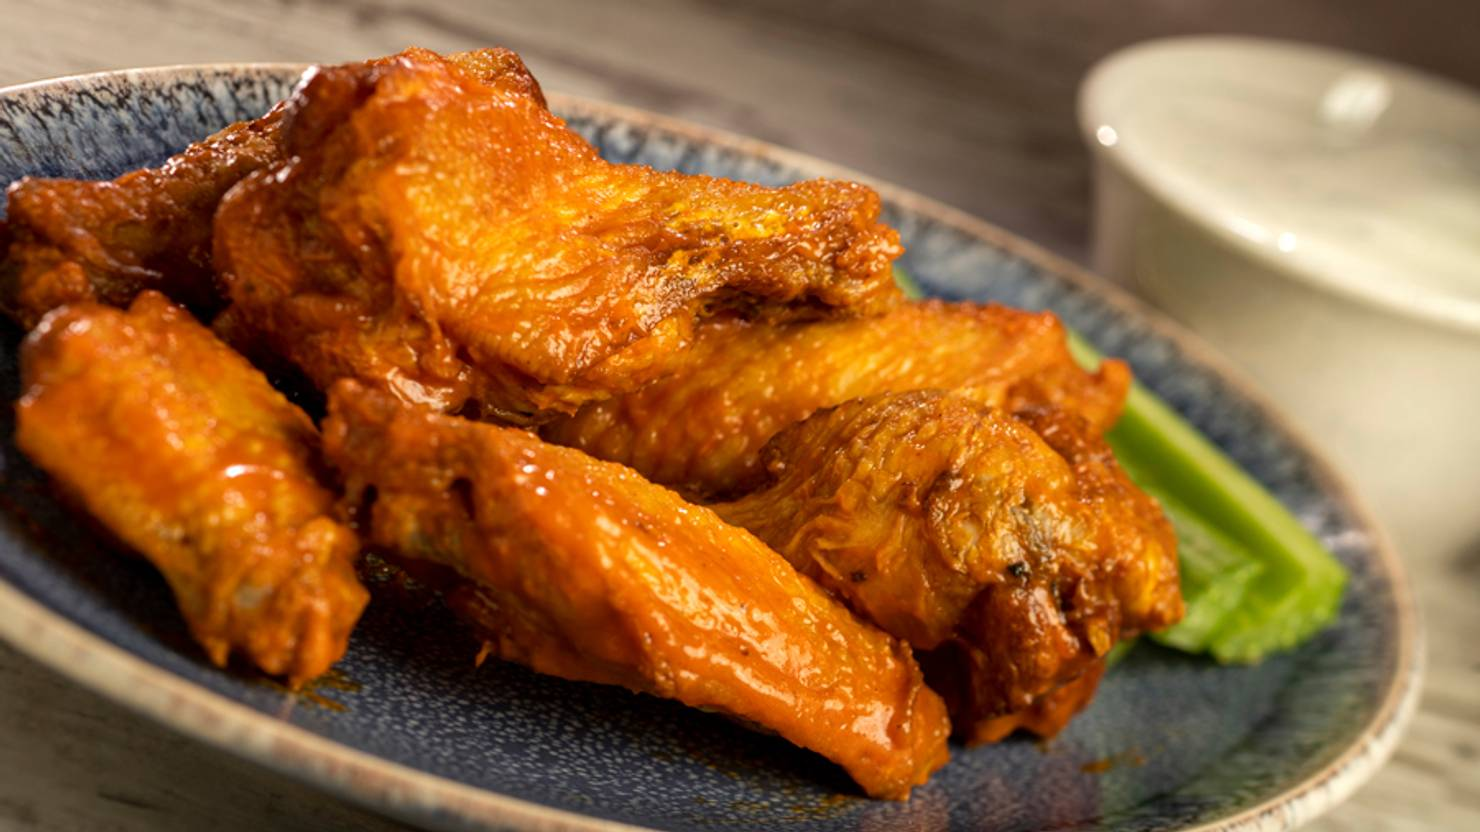 Brew-Wing - Garlic-Parmesan Wings